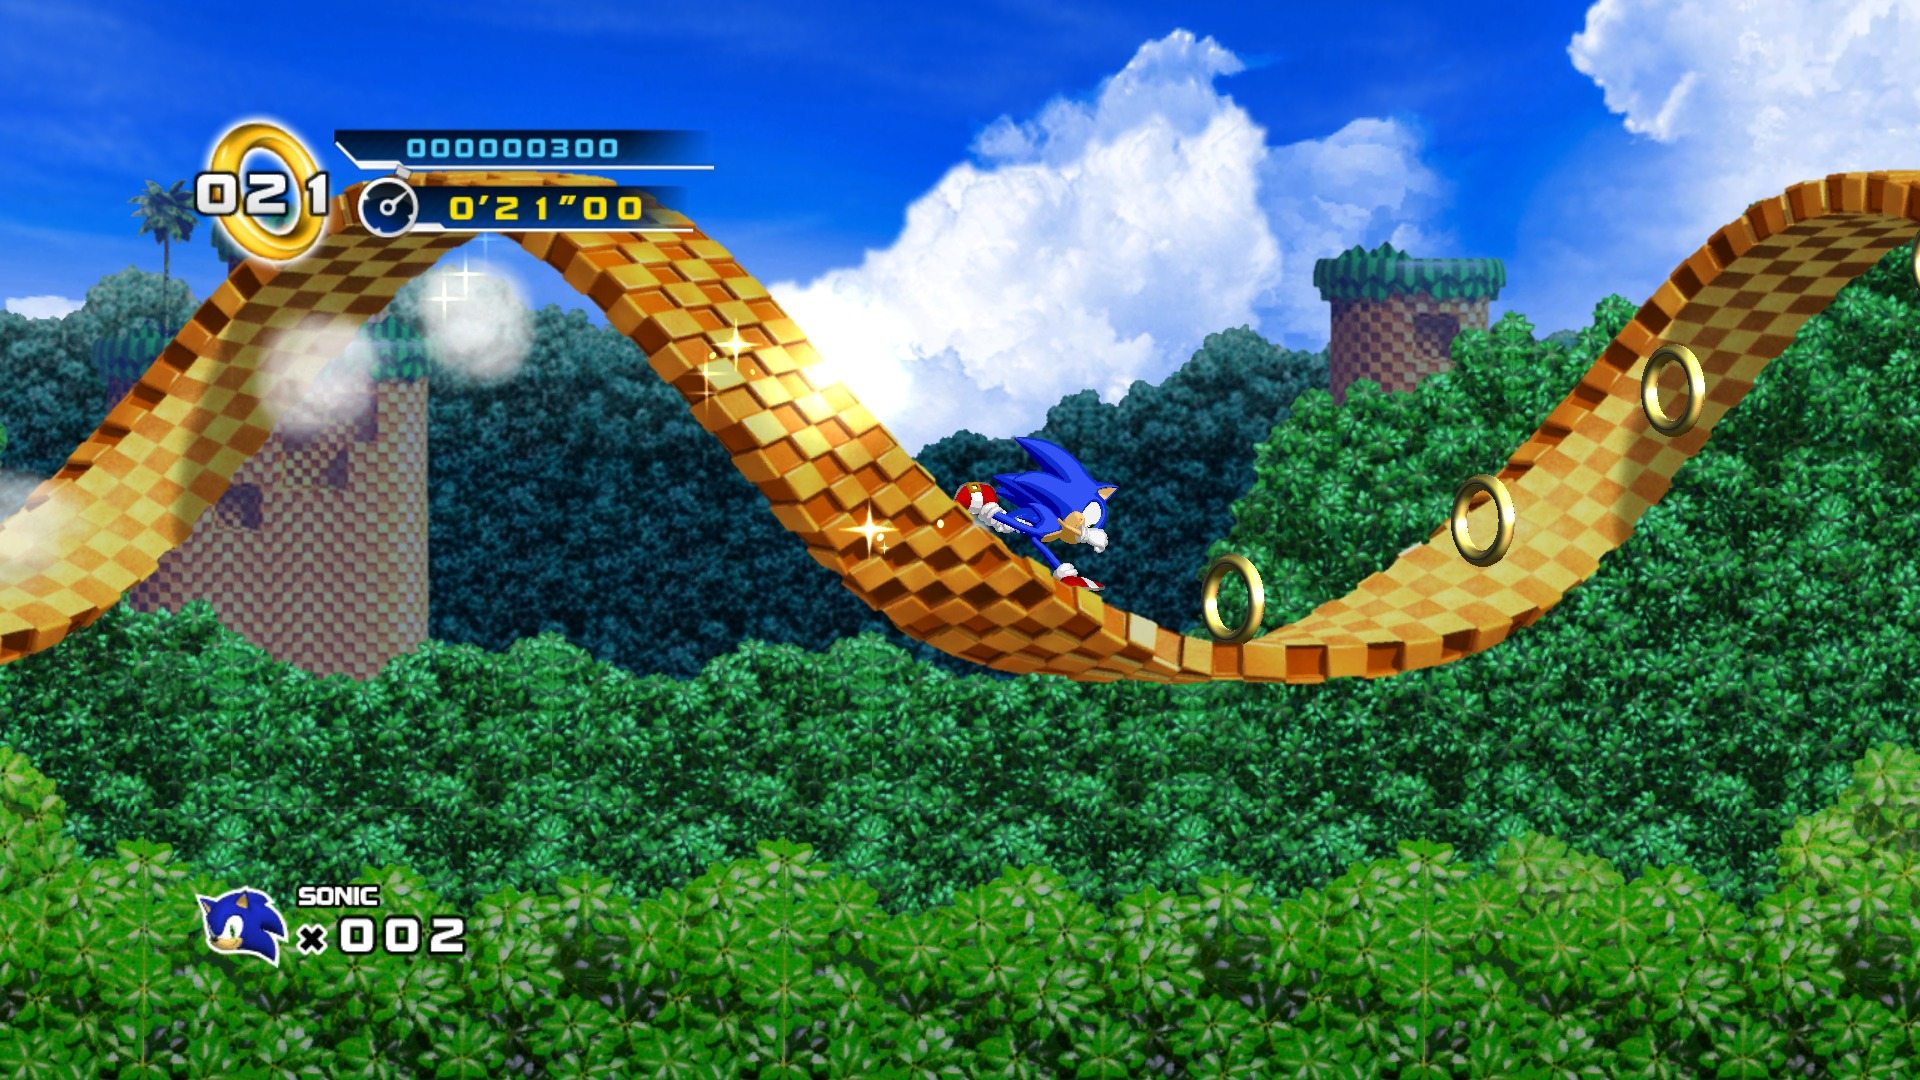 Sonic The Hedgehog 4 Episode 1 - Image 1